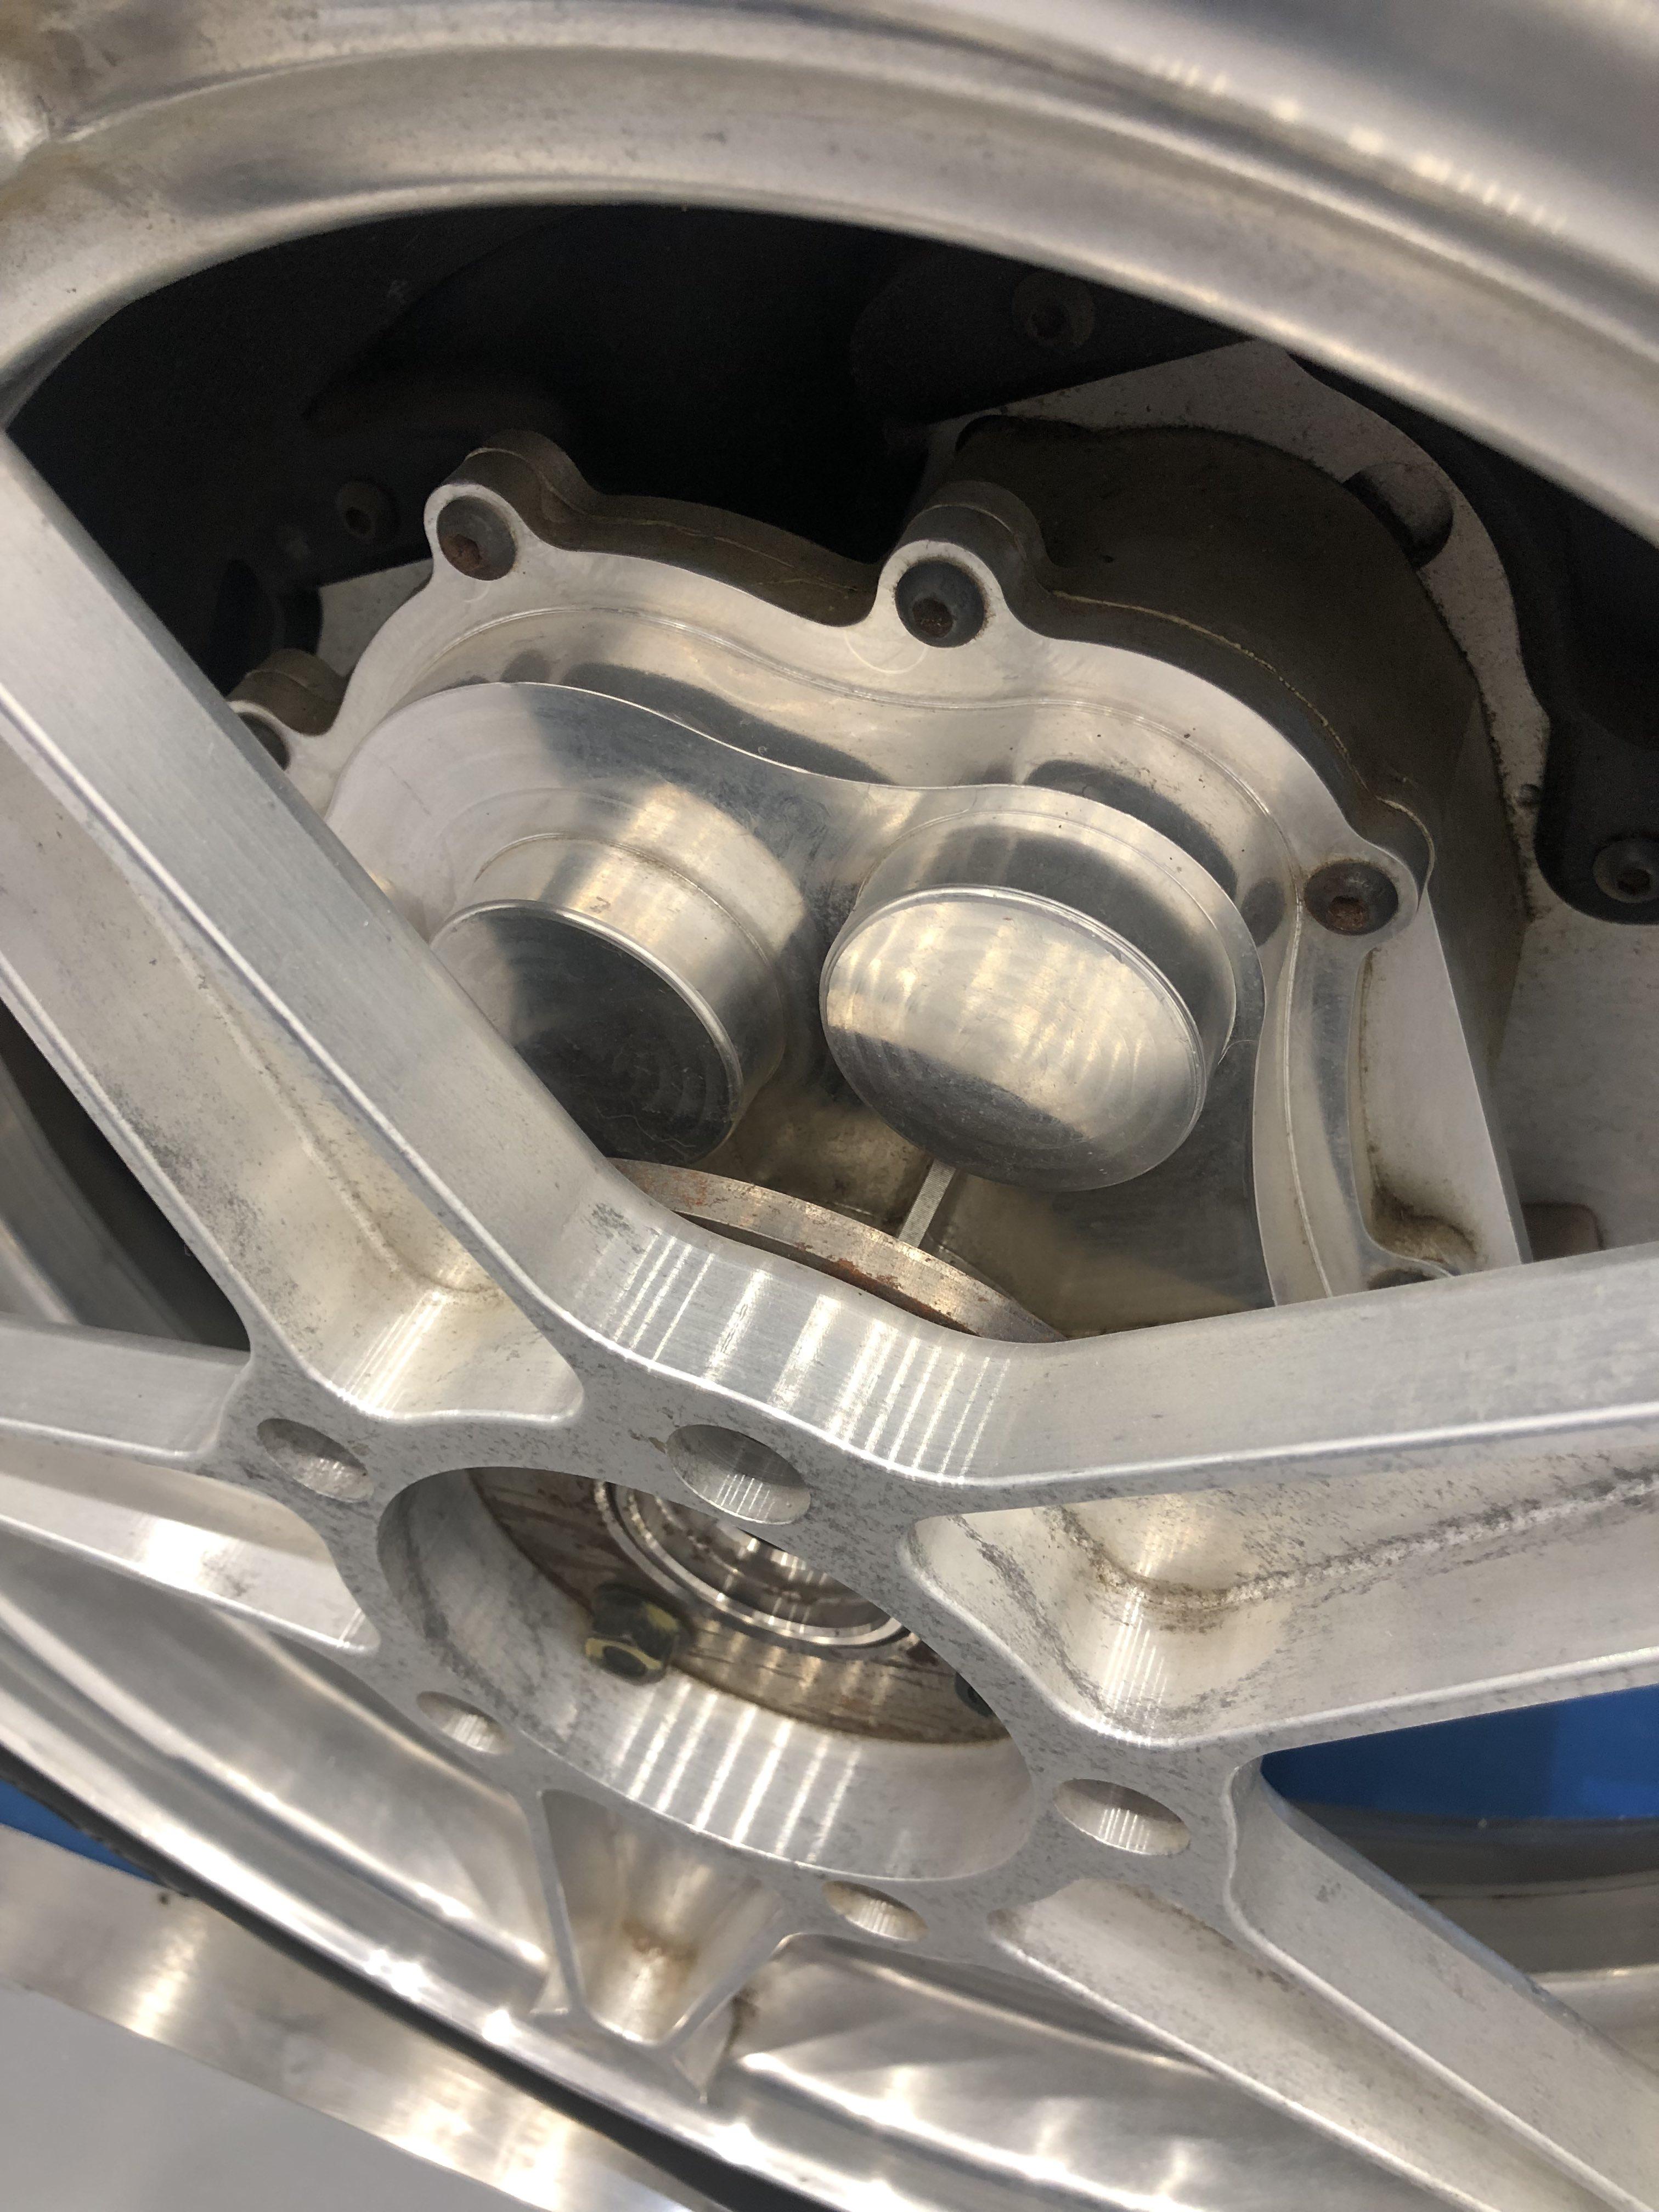 PUMA gearbox.jpg